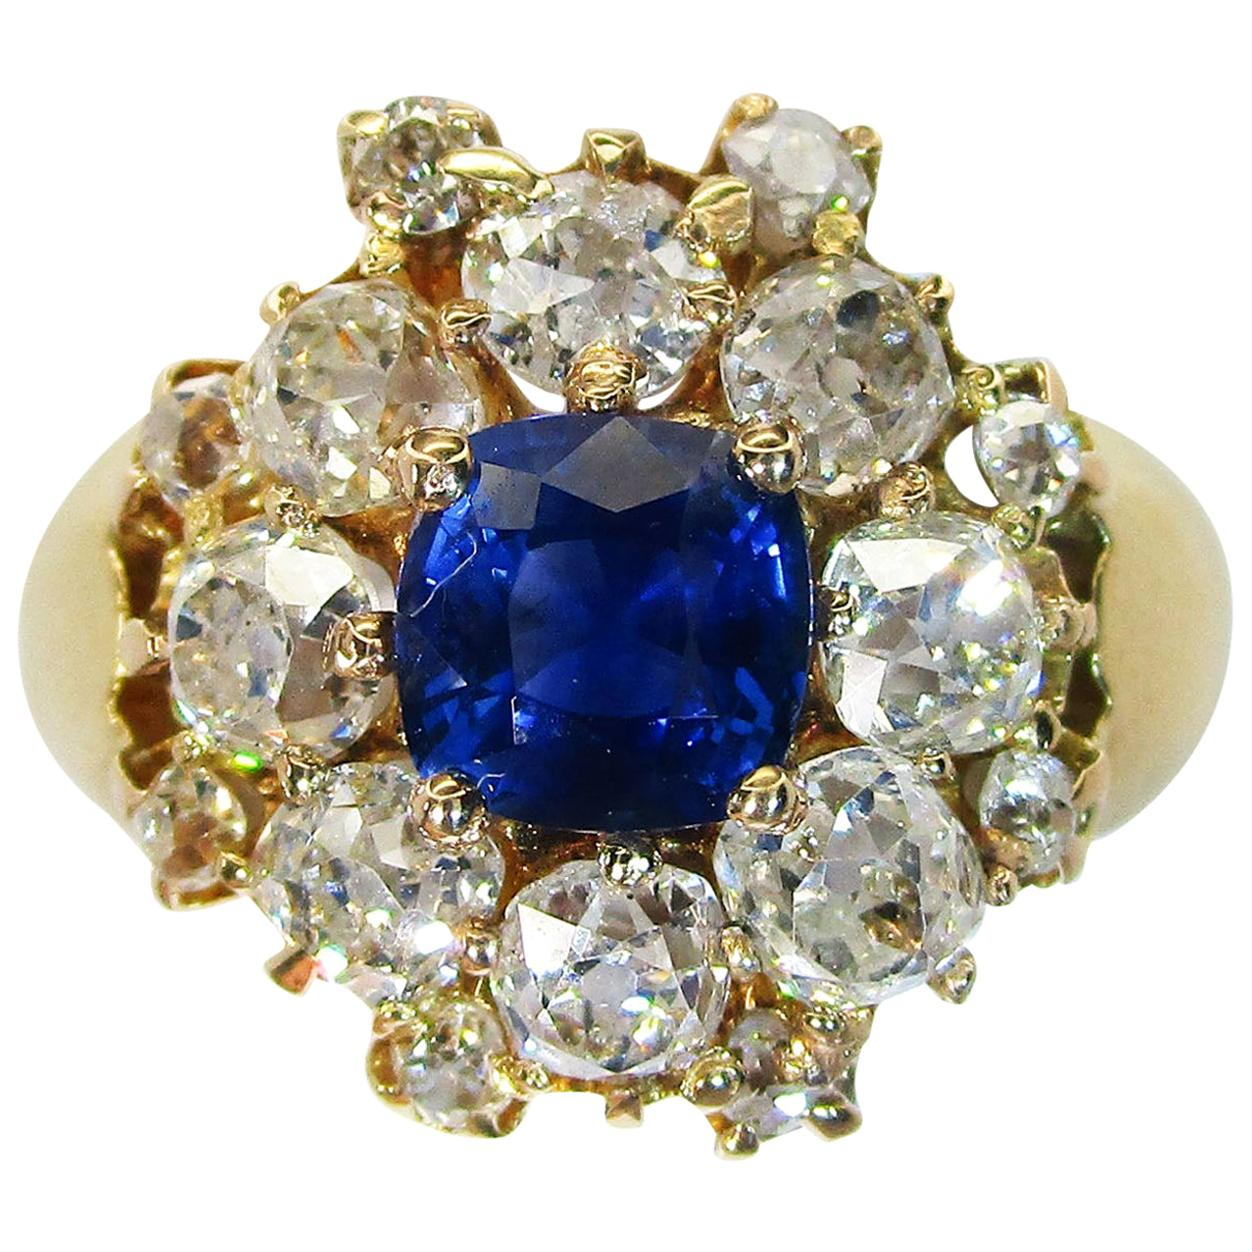 Edwardian 18 Karat Yellow Gold Sapphire and Diamond Cocktail Ring